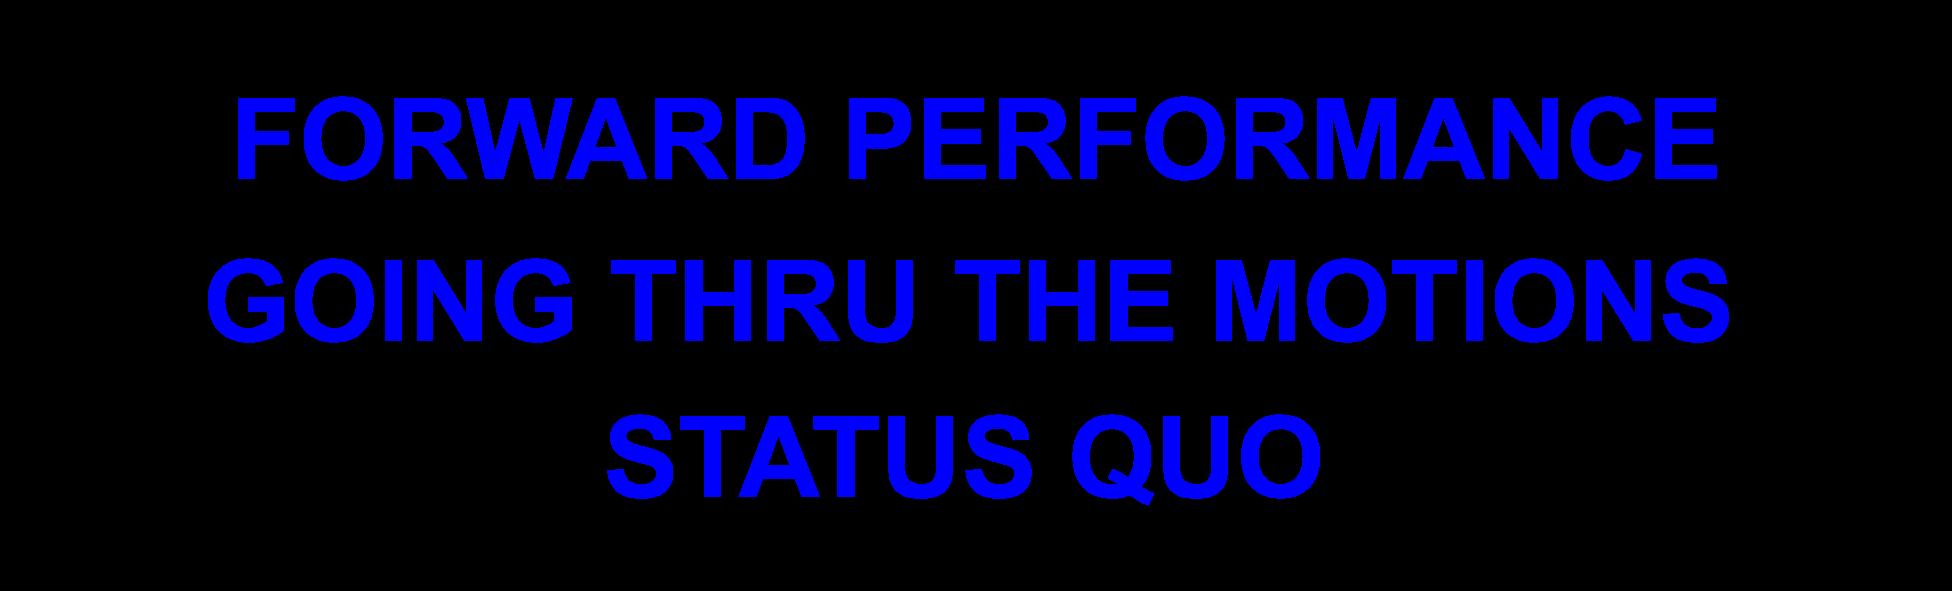 forward performance